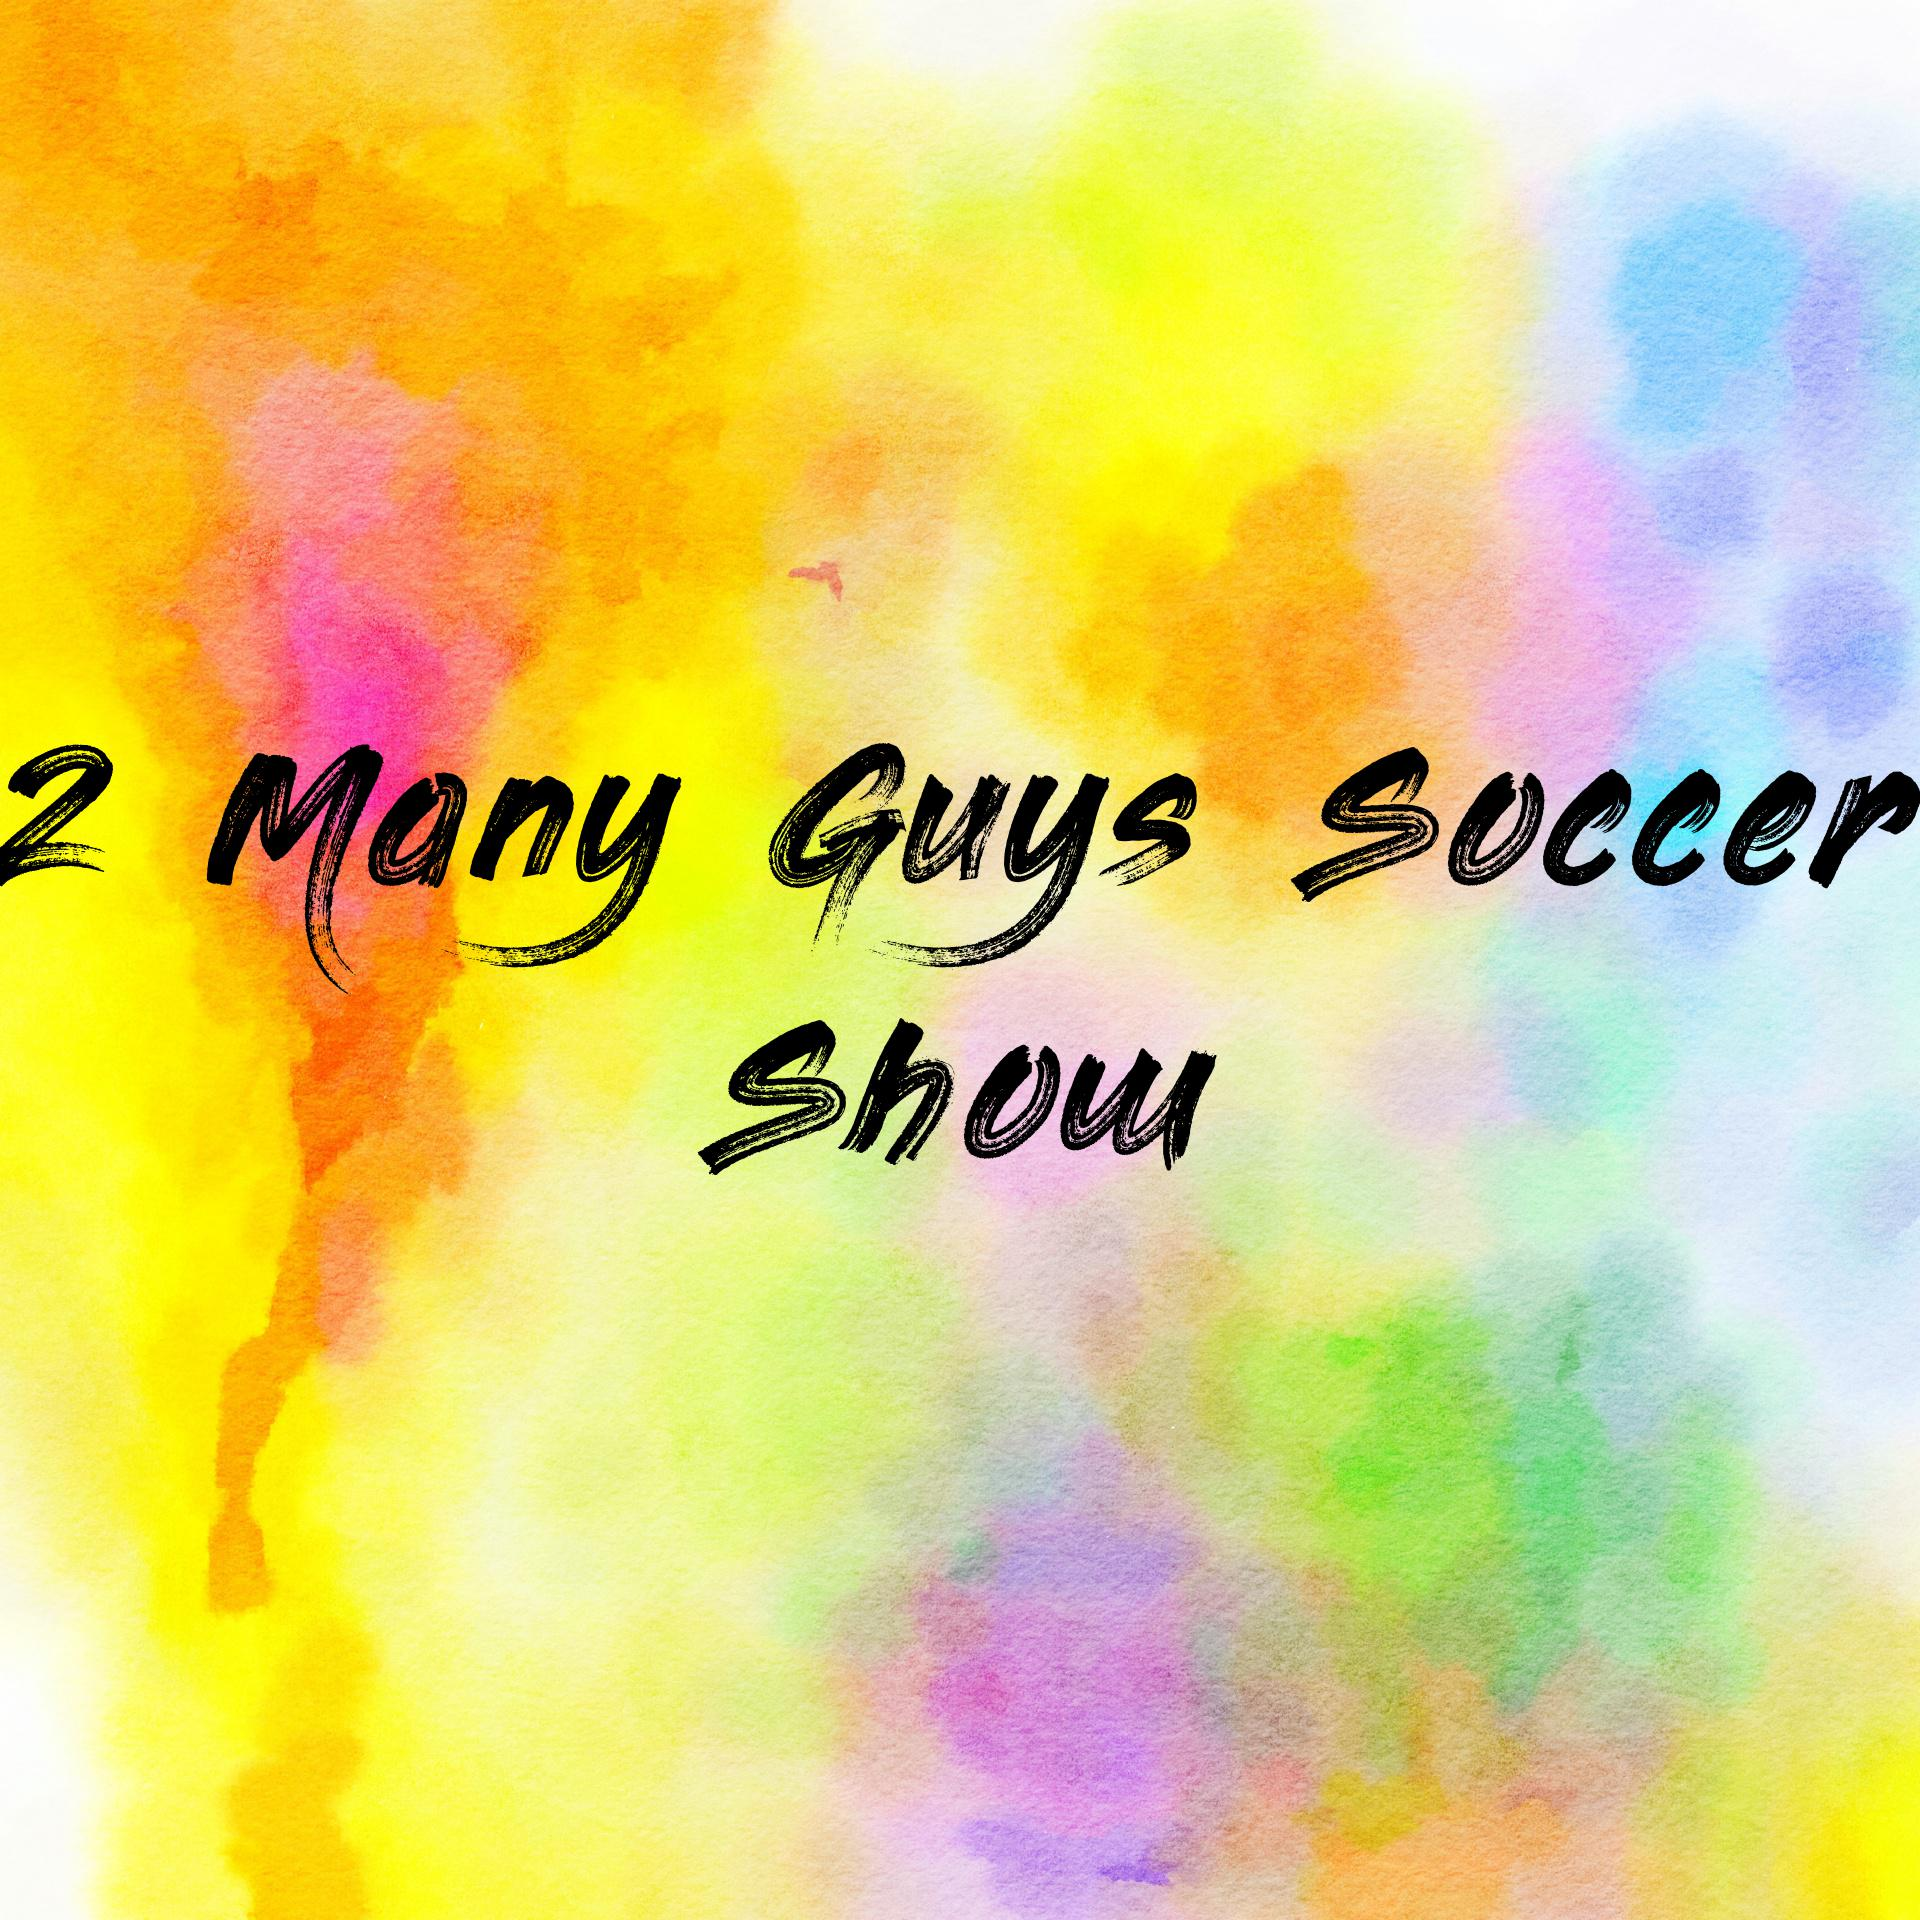 2 Many Guys Soccer Show